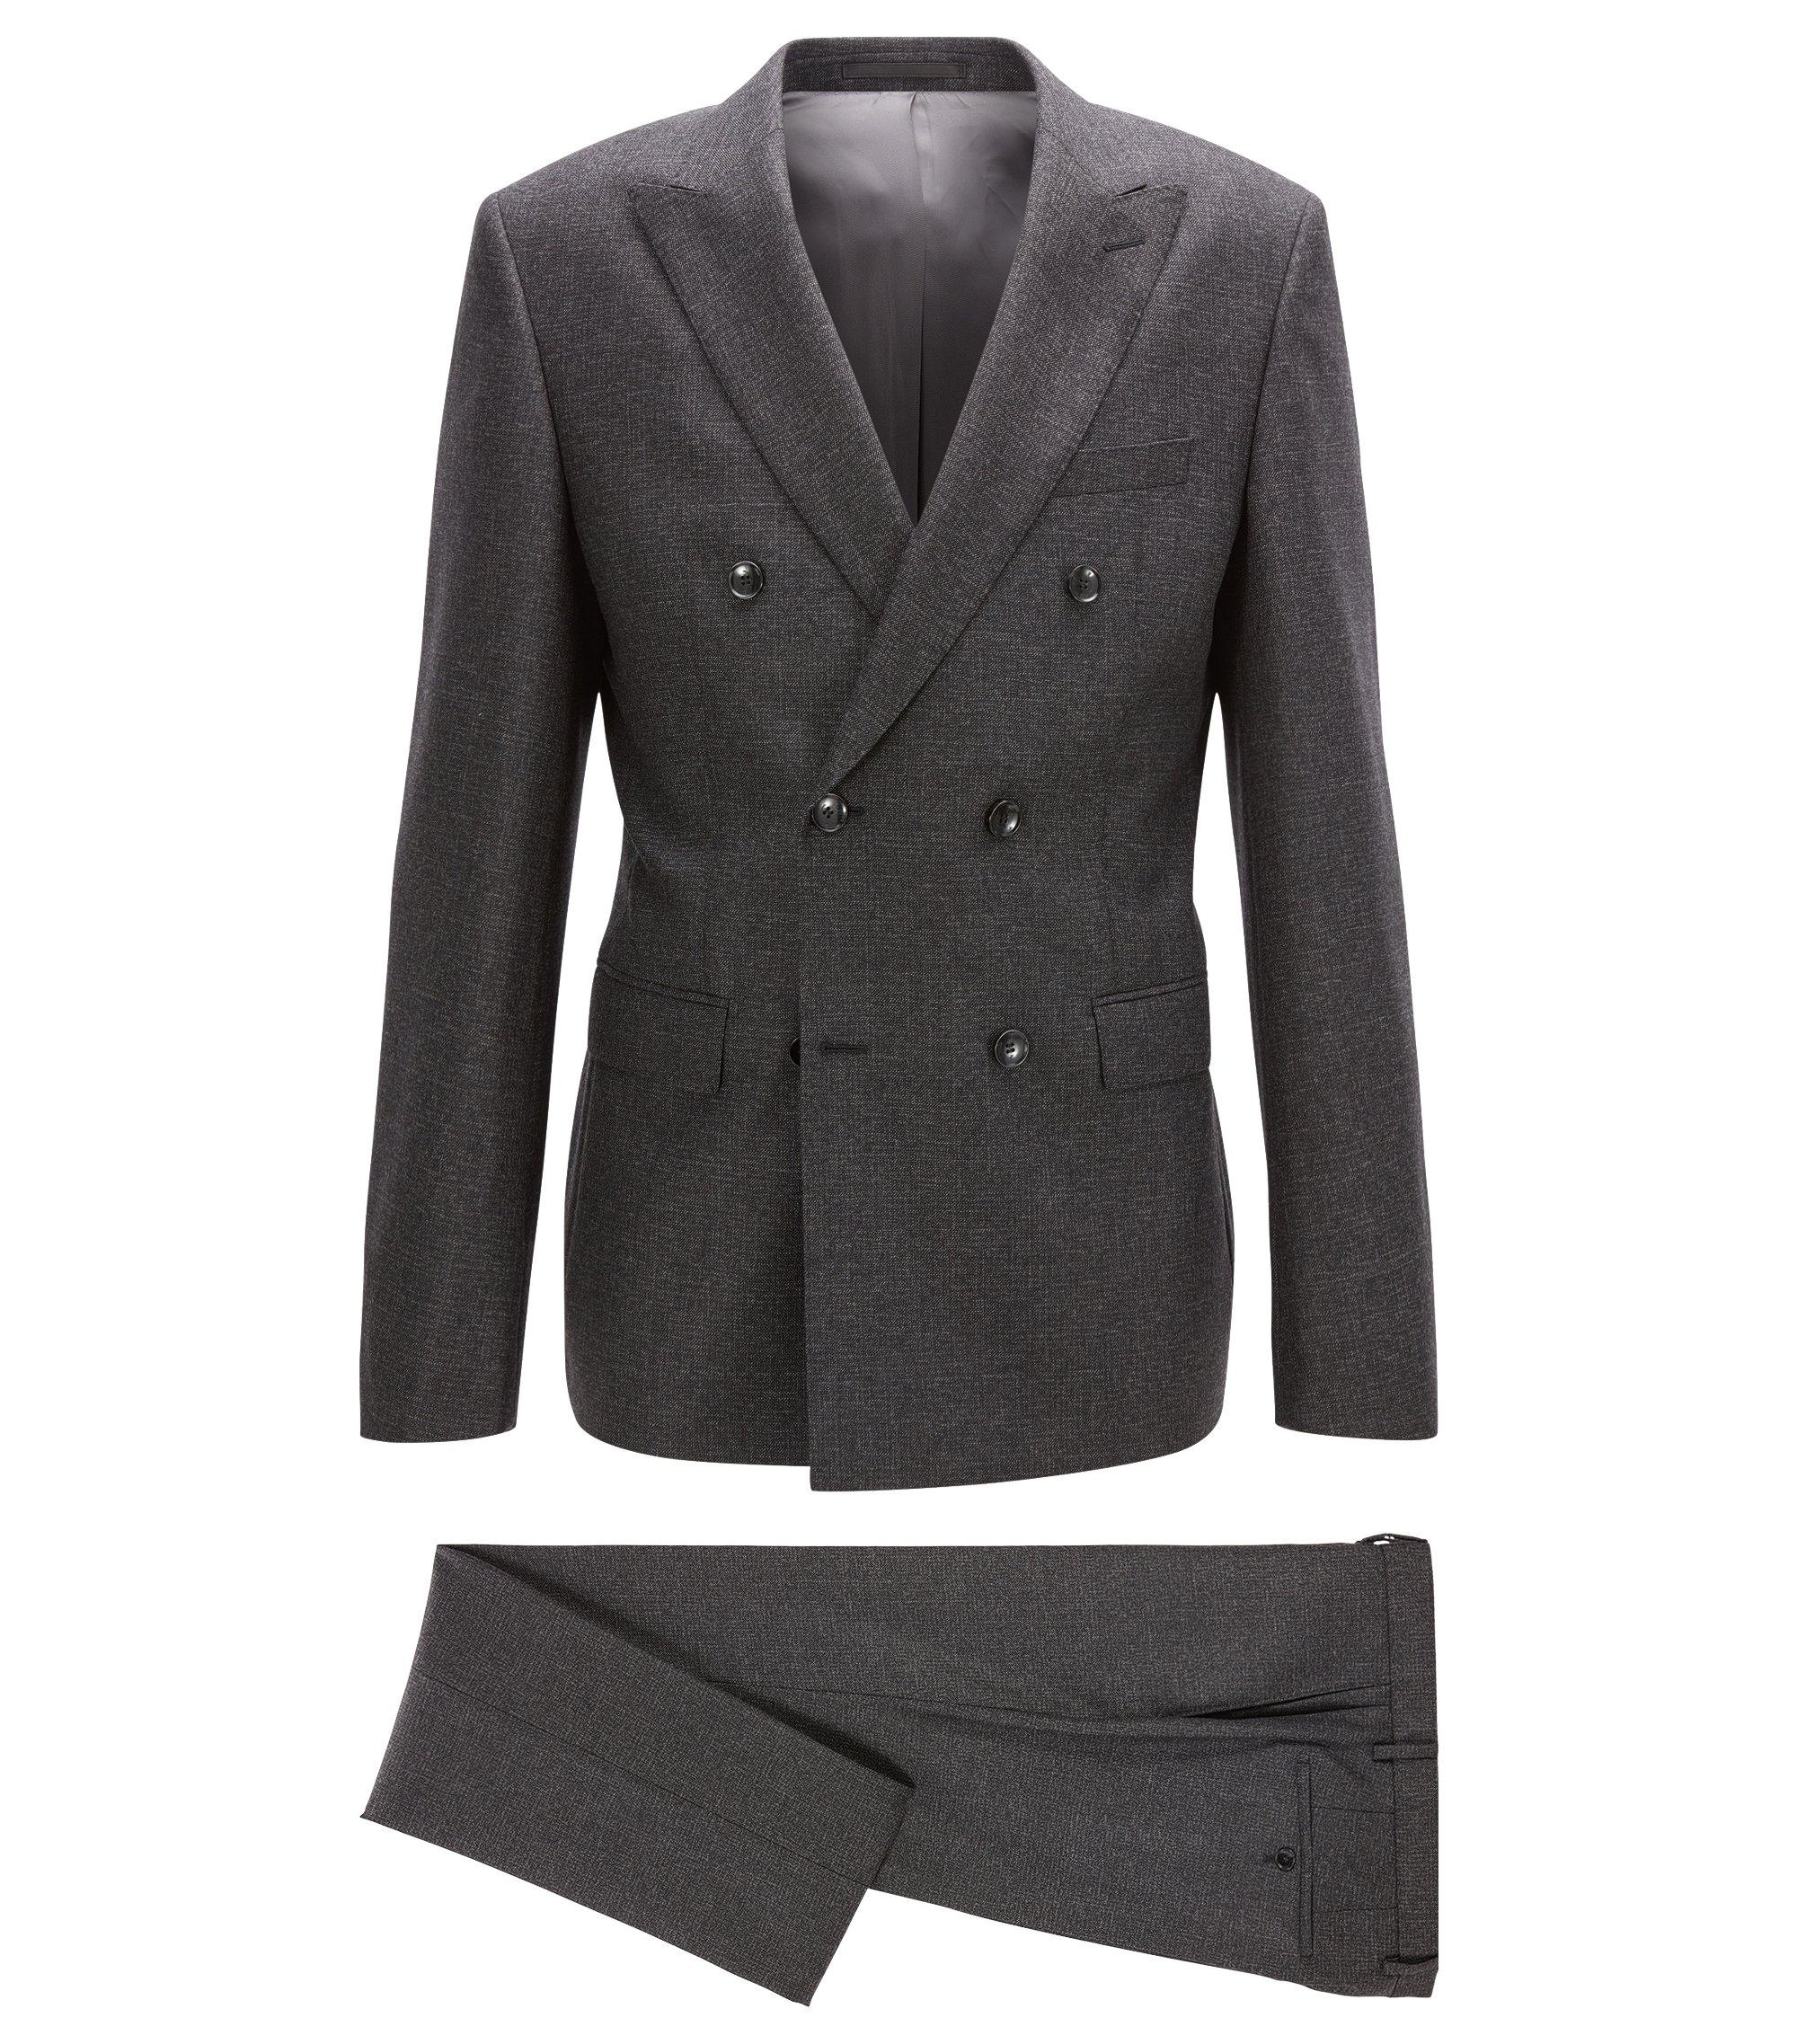 Virgin Wool-Cashmere Suit, Slim Fit   T-Hayward/Gunt, Open Grey